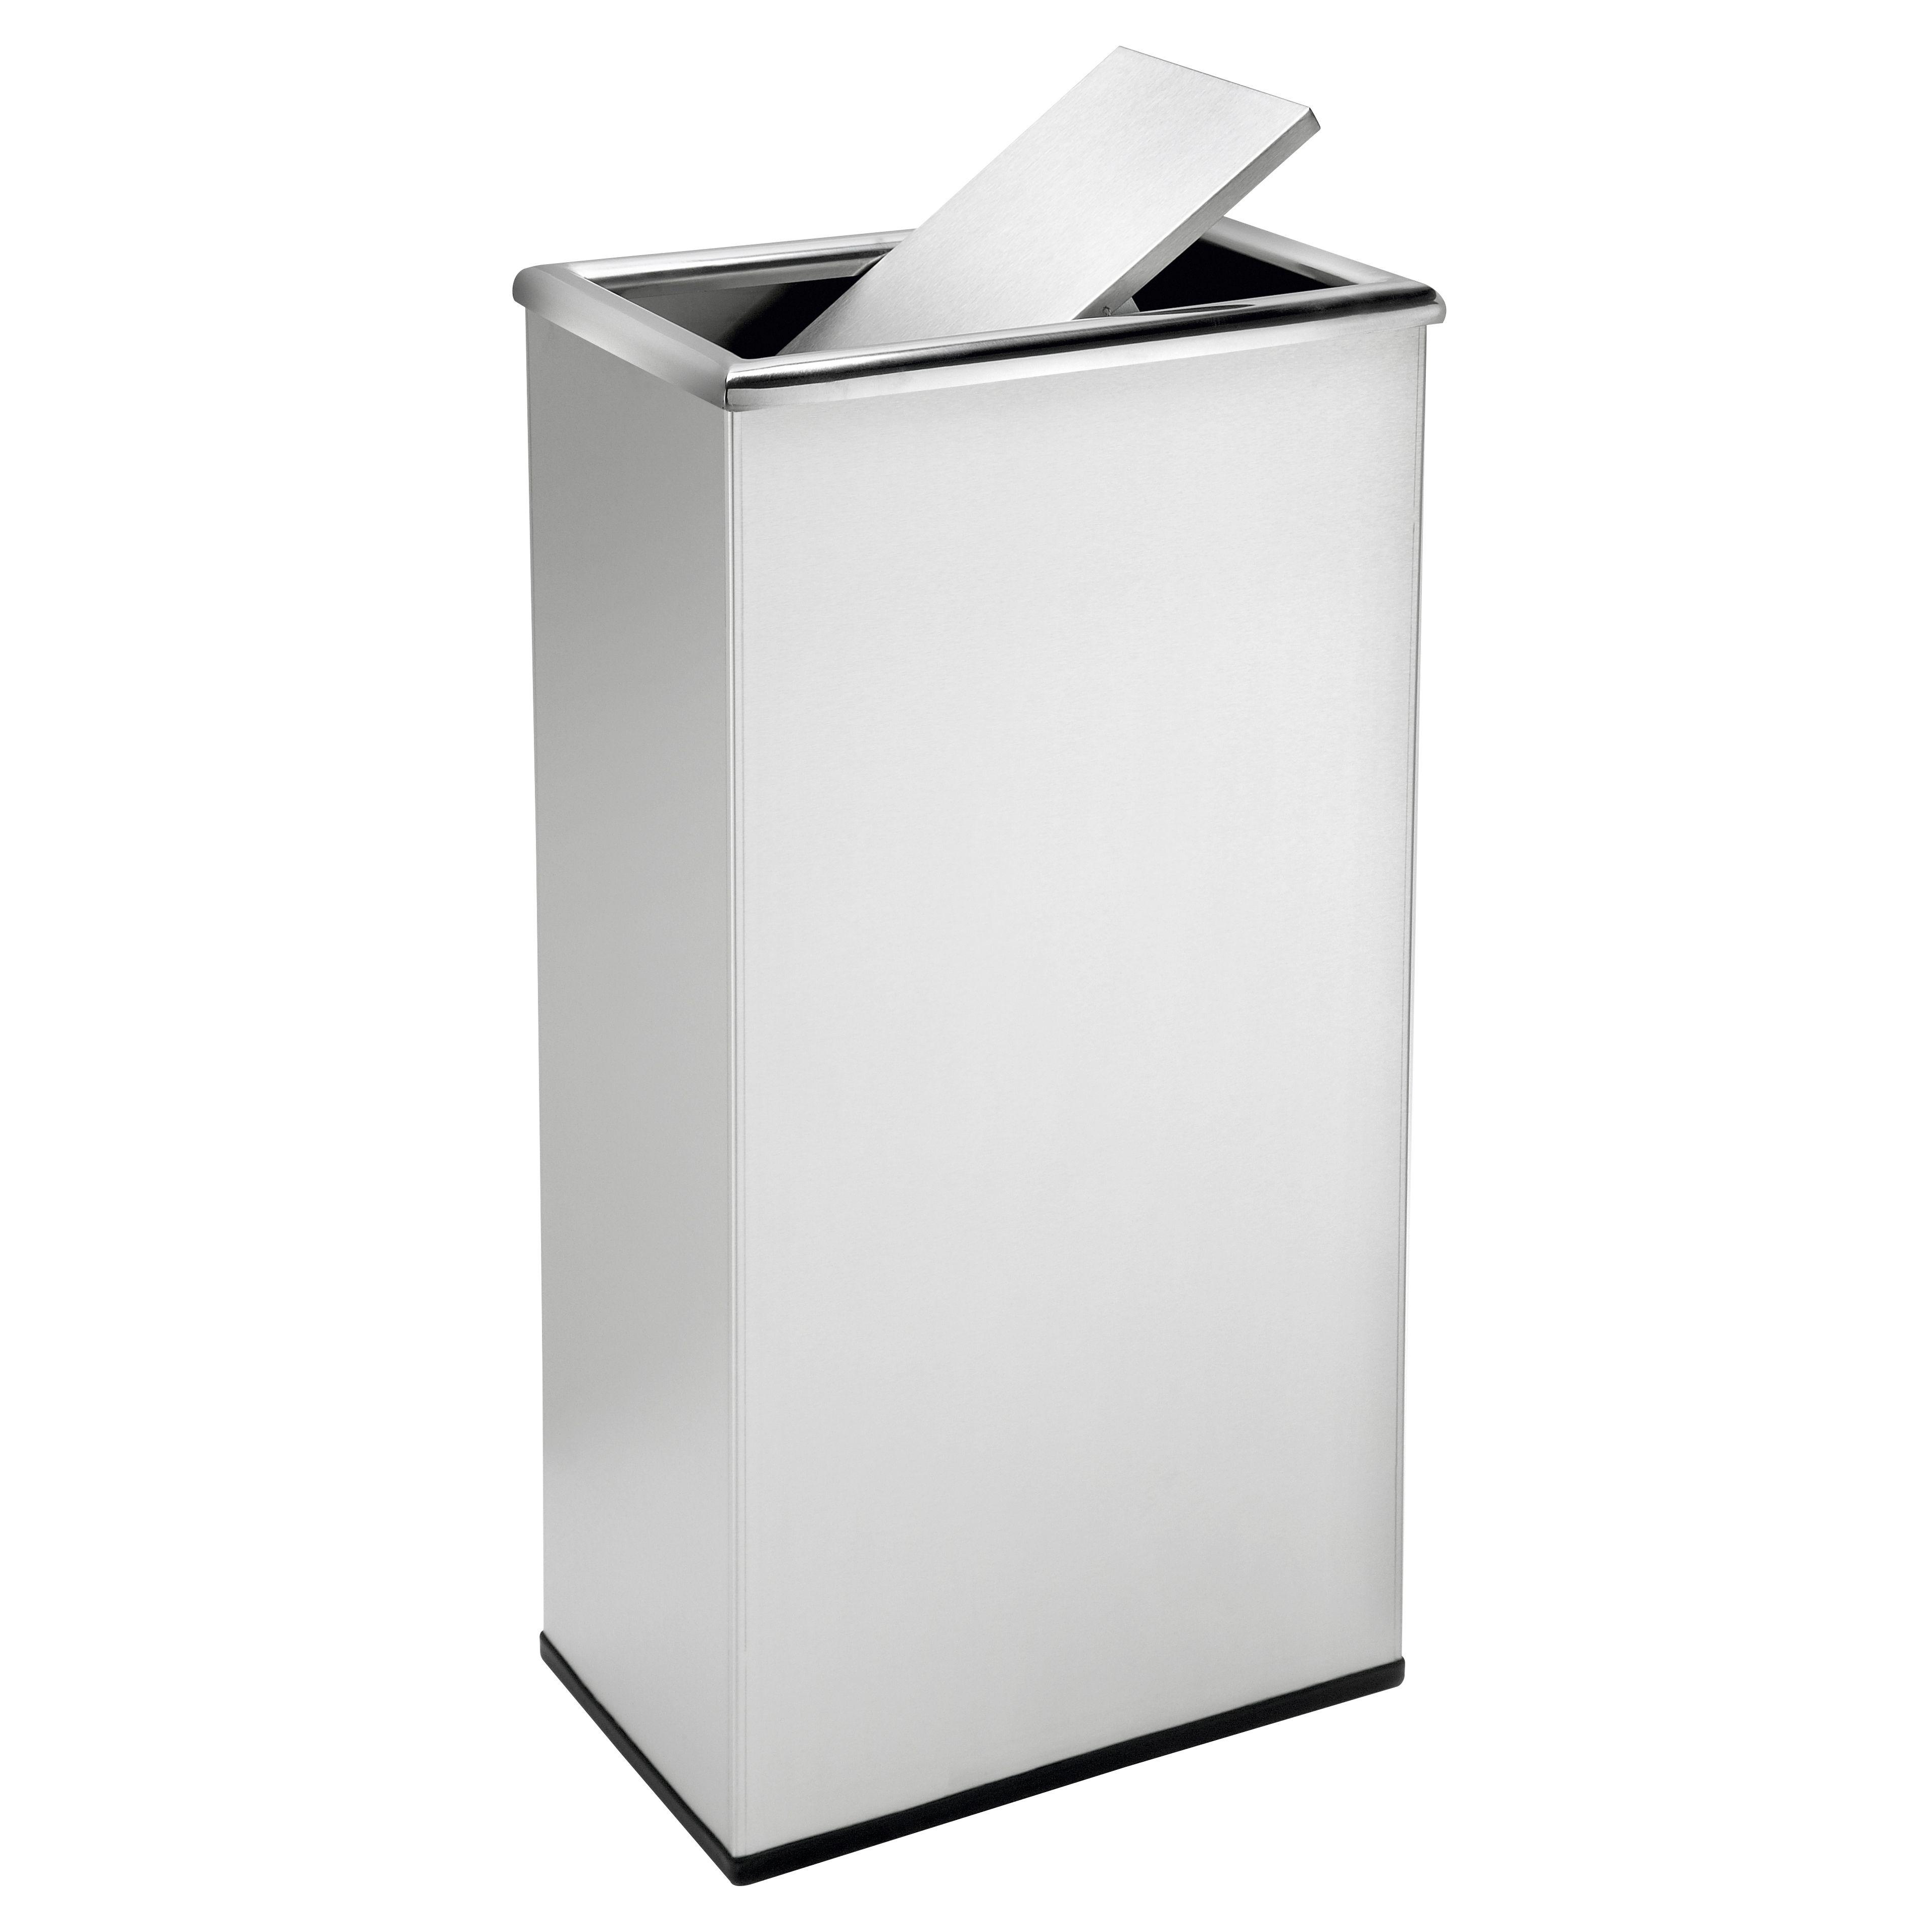 13 Gallon Steel Trash Can Swivel Top Trash Can Trash Can